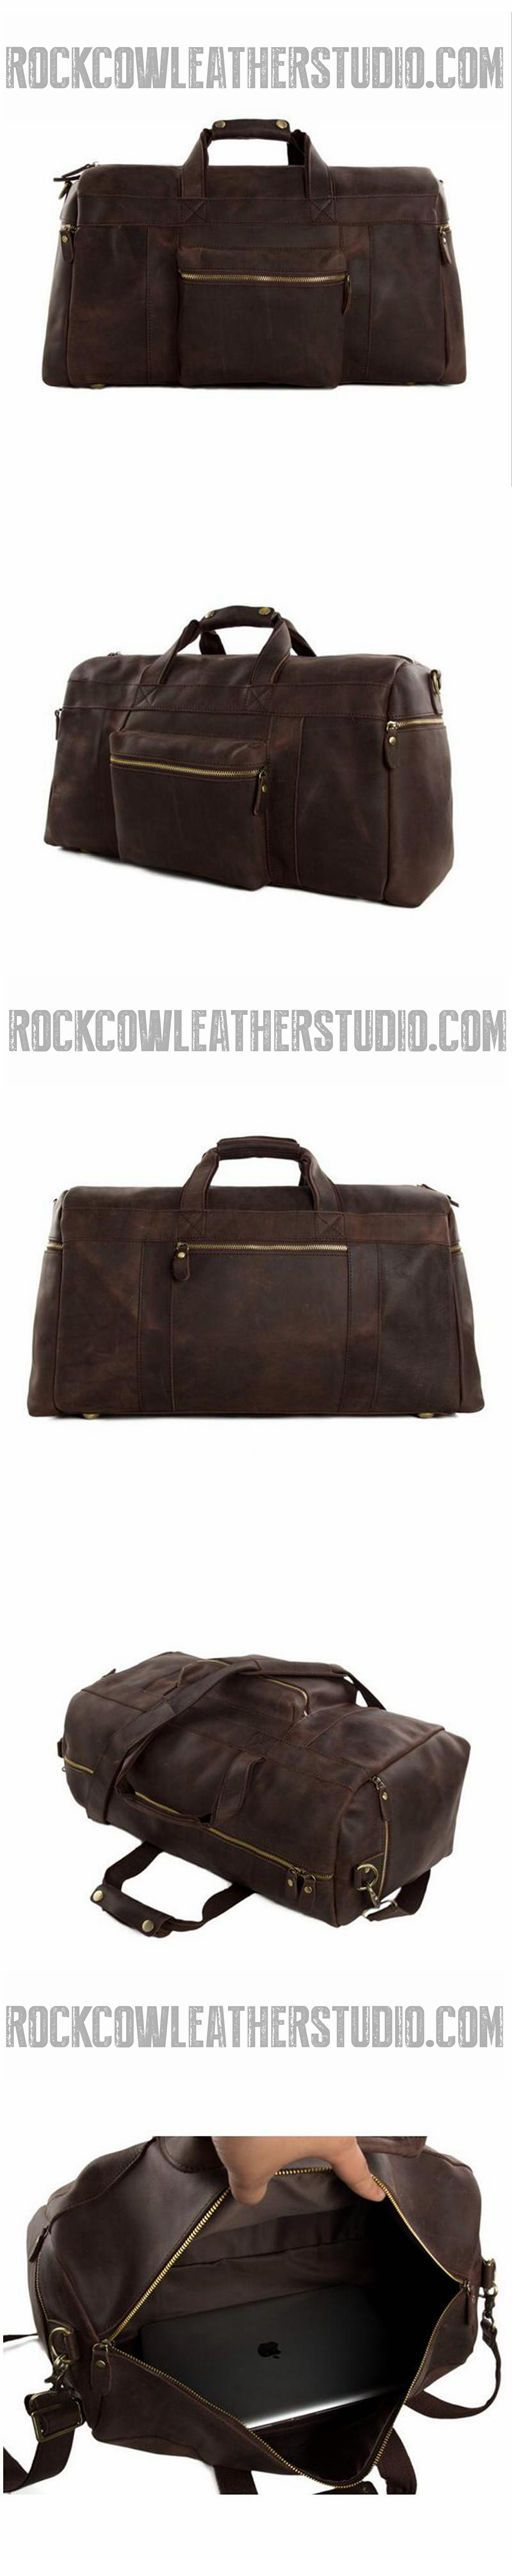 "Vintage Genuine Leather Cowhide 23"" Large Capacity Travel Luggage Men Duffle Gym Bags 1098"